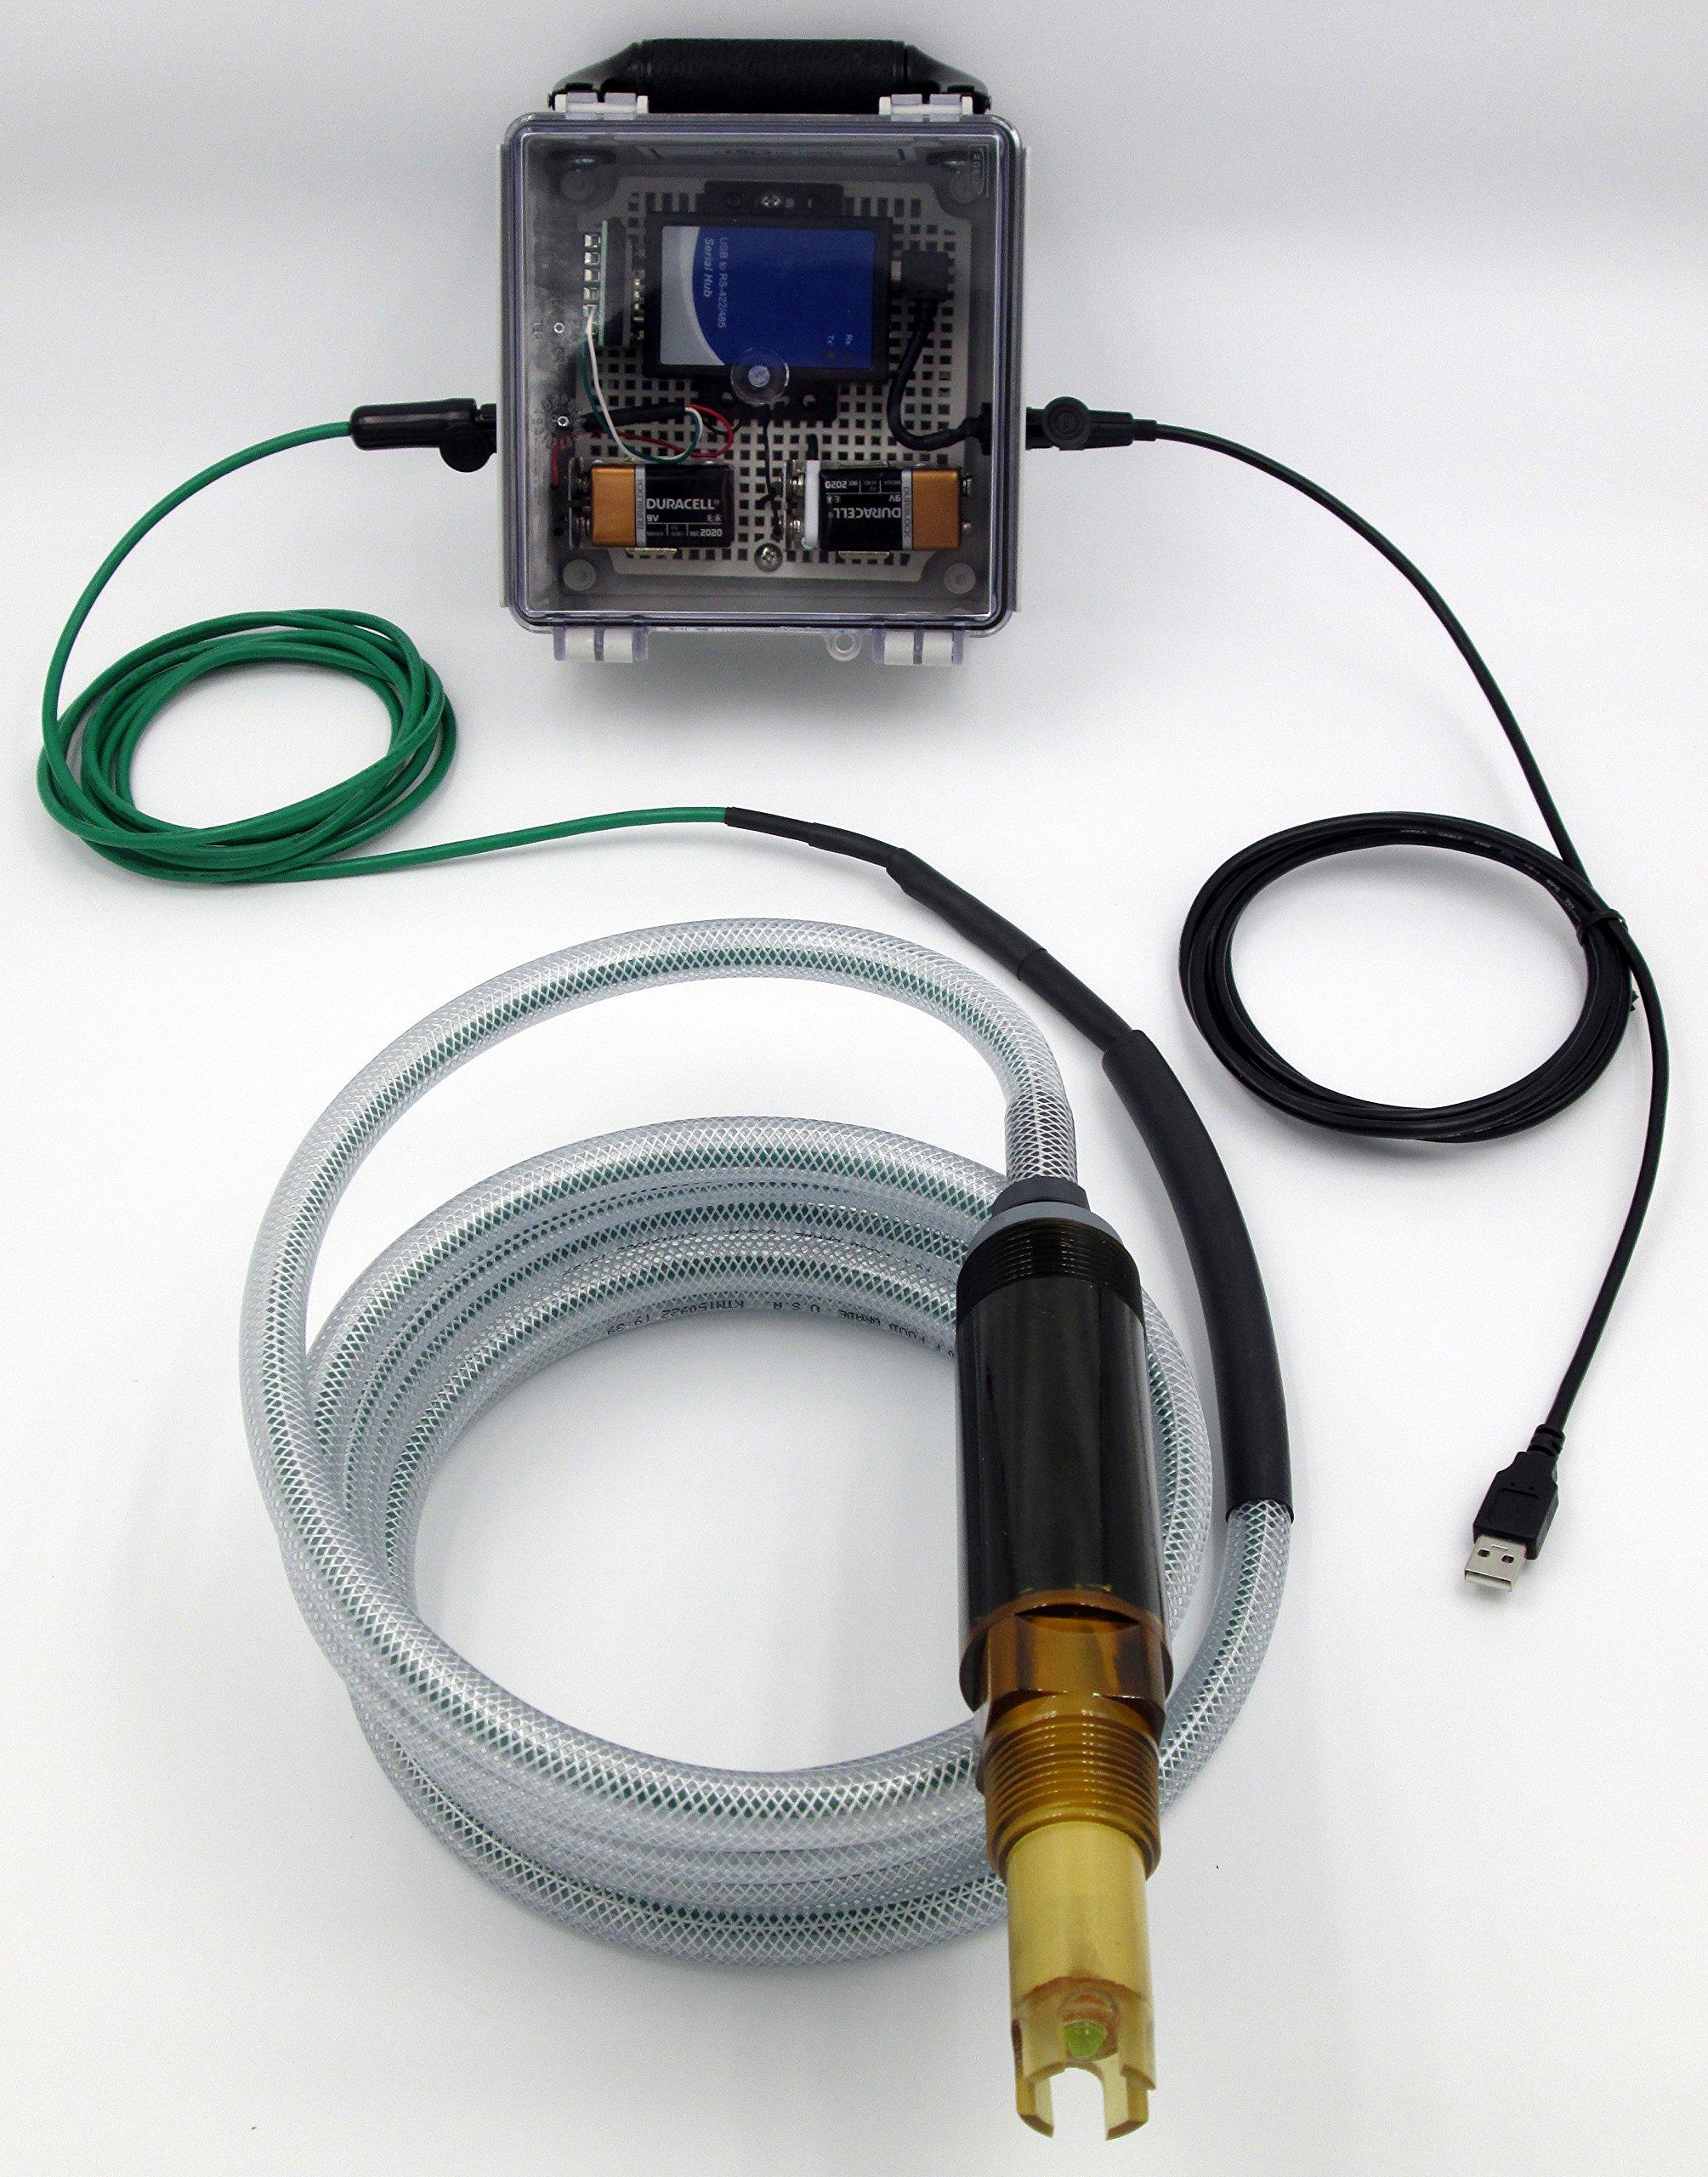 Industrial pH Measurement System using 3TX-HiQ Windows Software & HiQ to Windows NEMA 4X Bridge Box; Extremely Rugged Smart Digital ZEUS pH Sensor for Inline, Immersion & Submersible Use